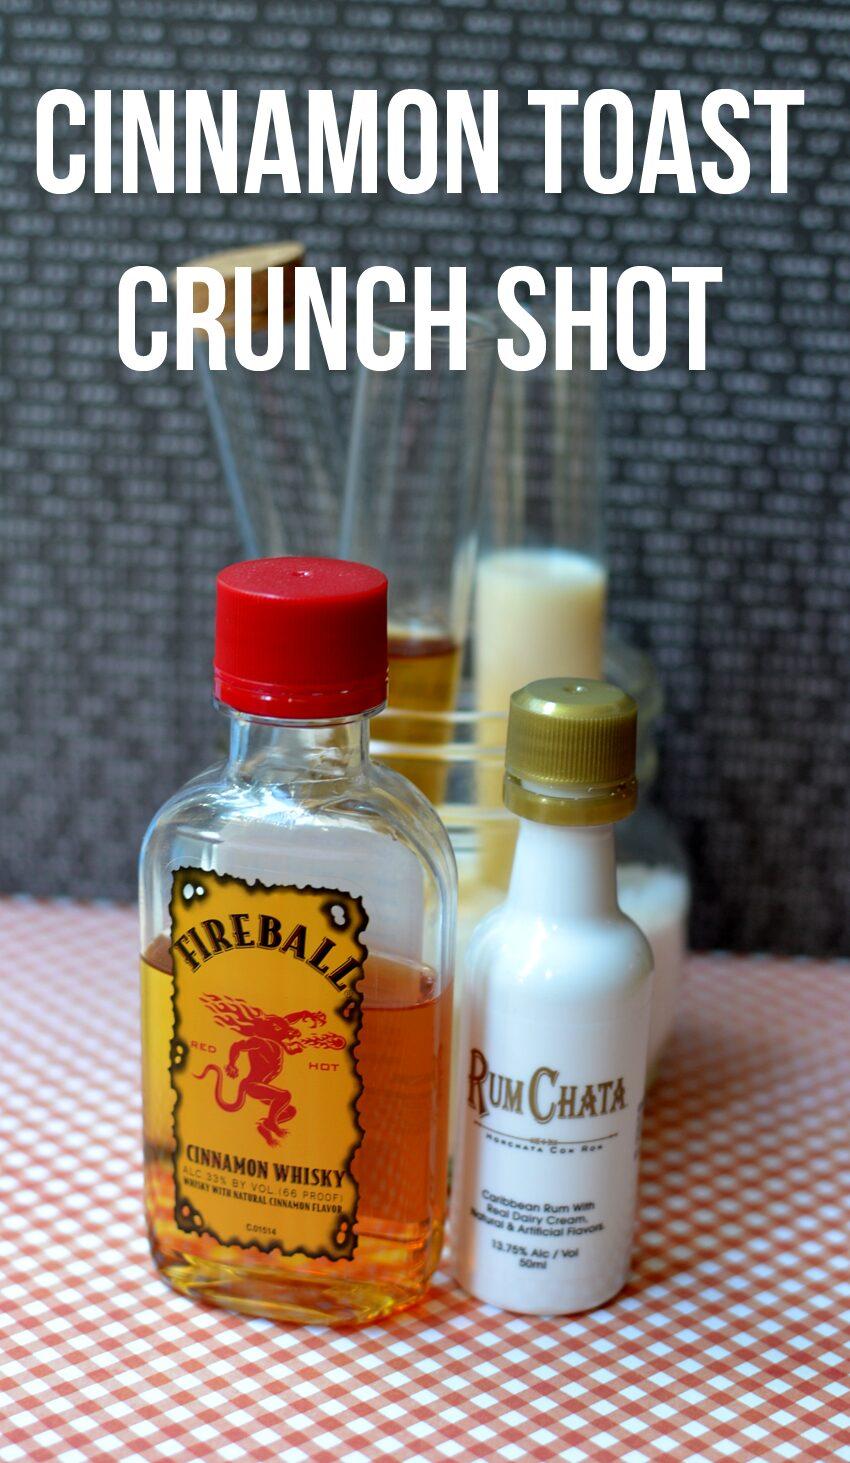 Cinnamon Toast Crunch Shots